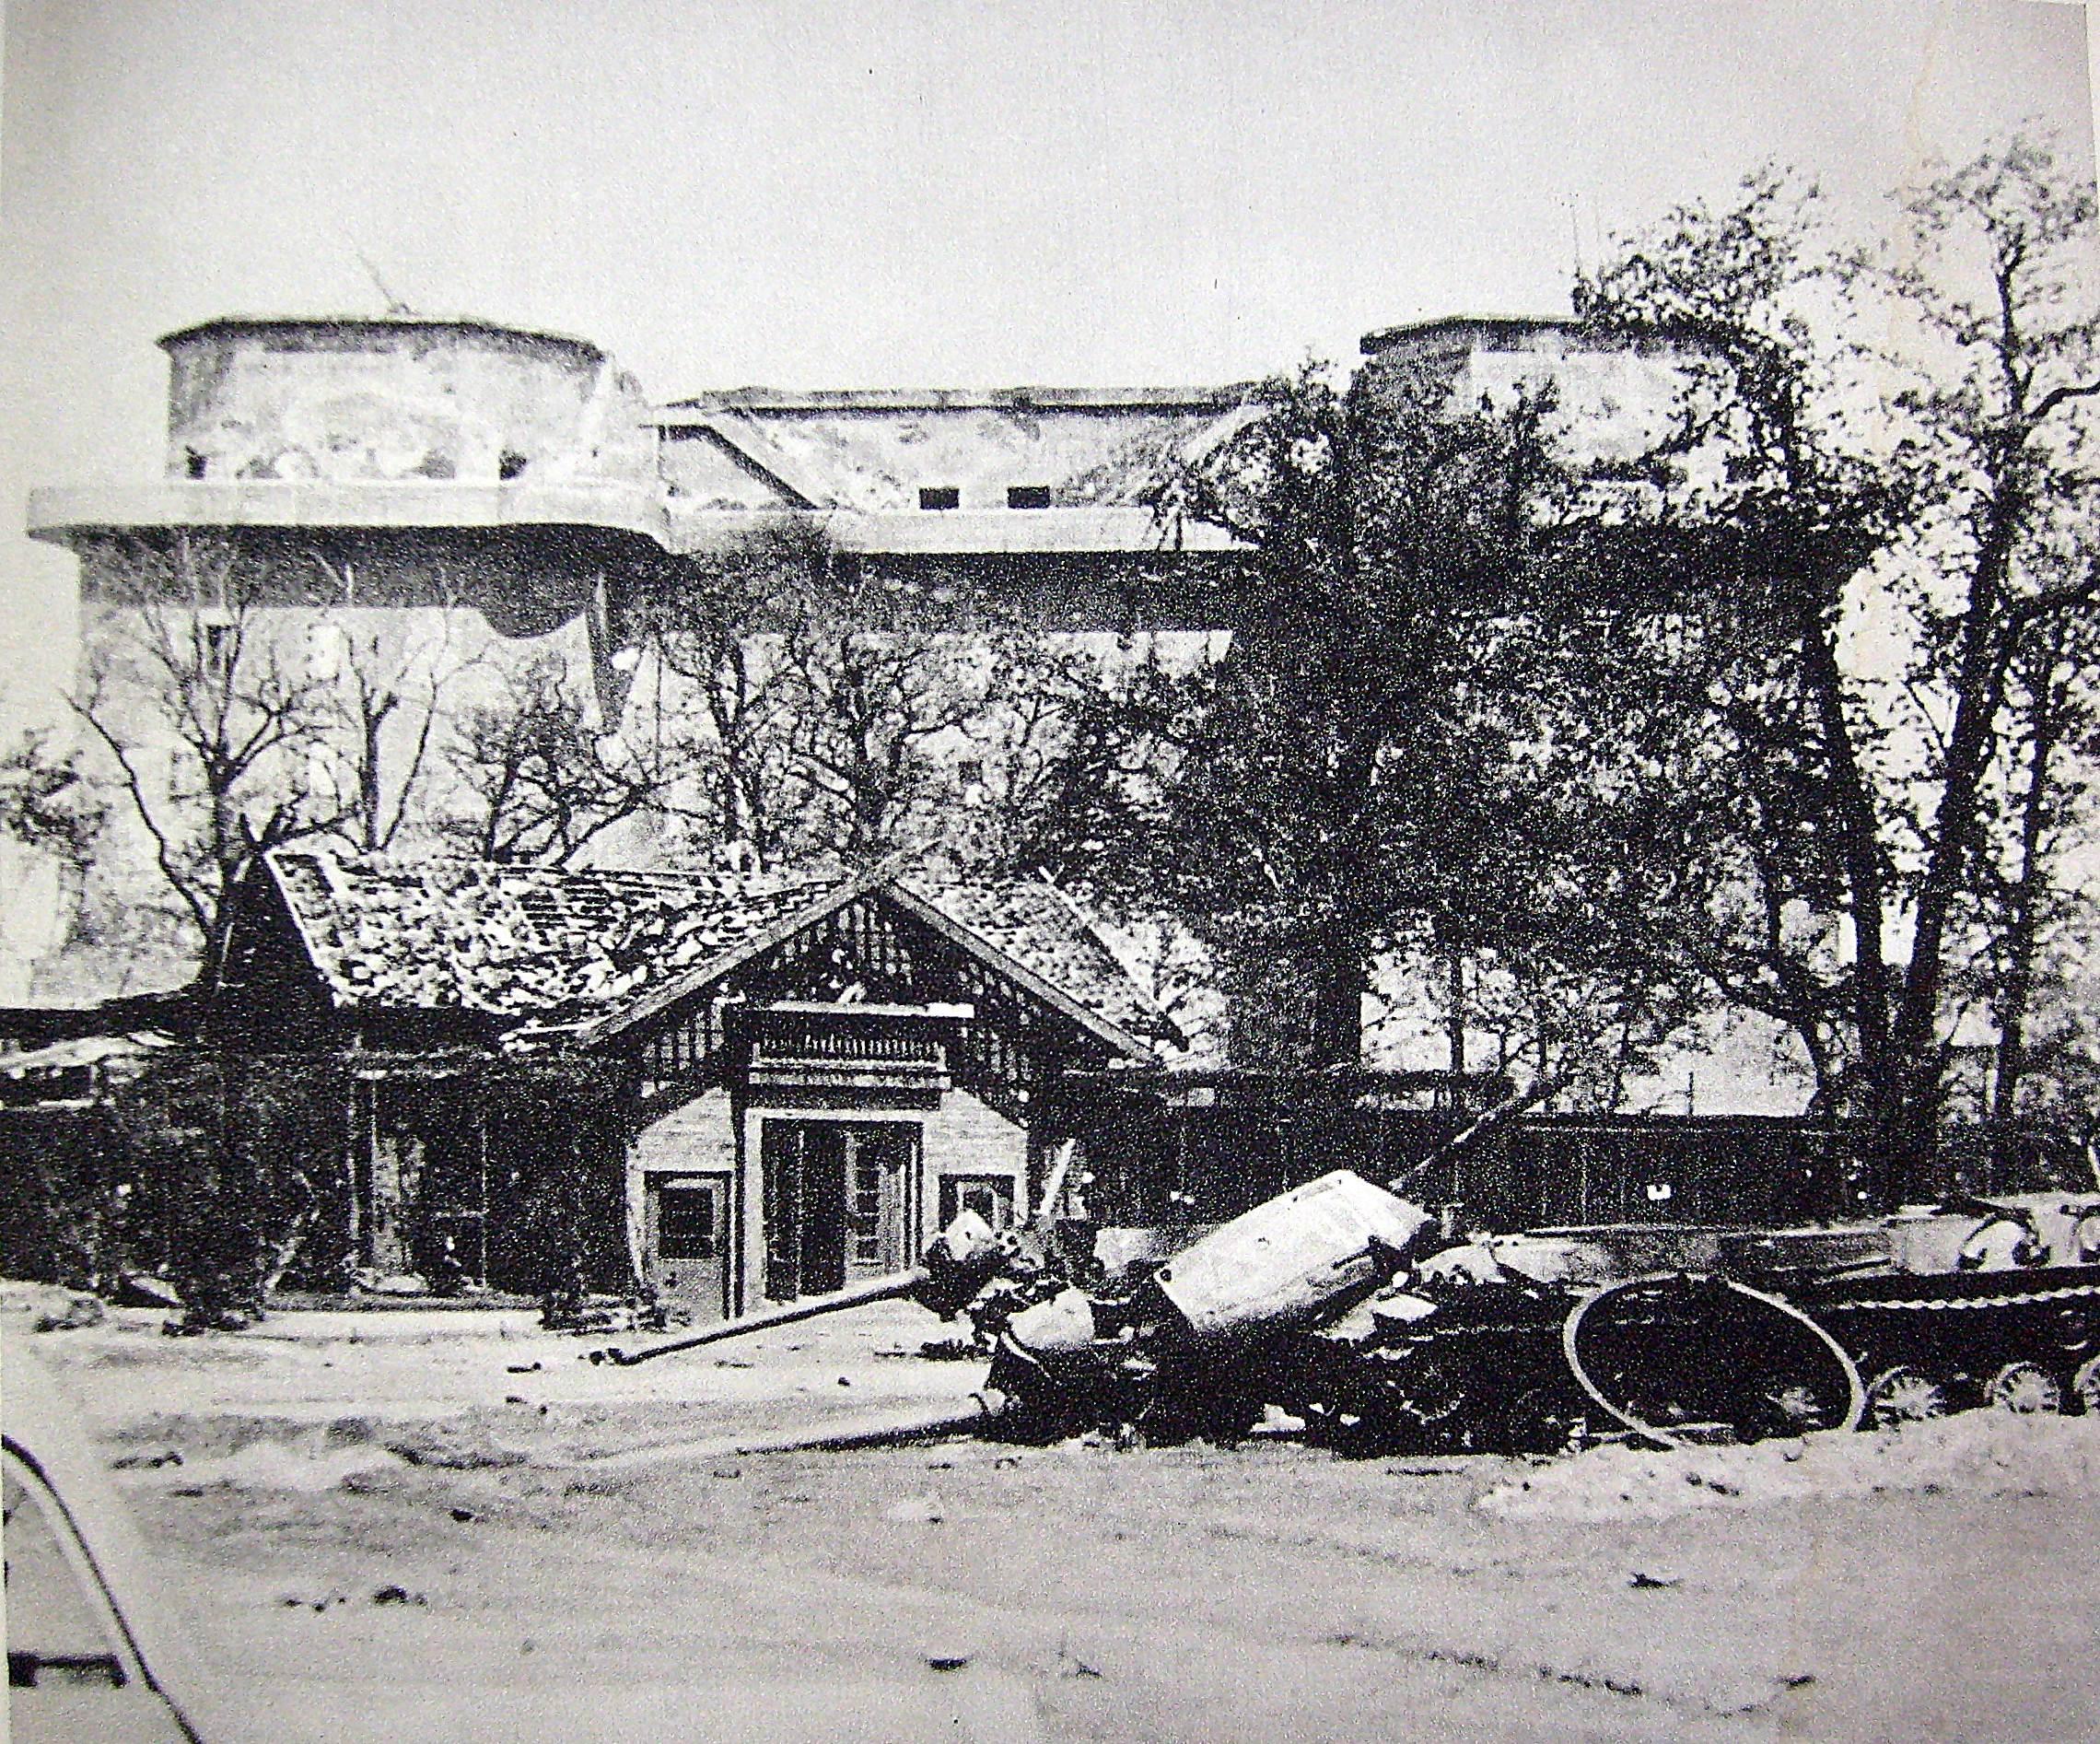 File:Maj 1945 schron Berlin ZOO.JPG - Wikimedia Commons